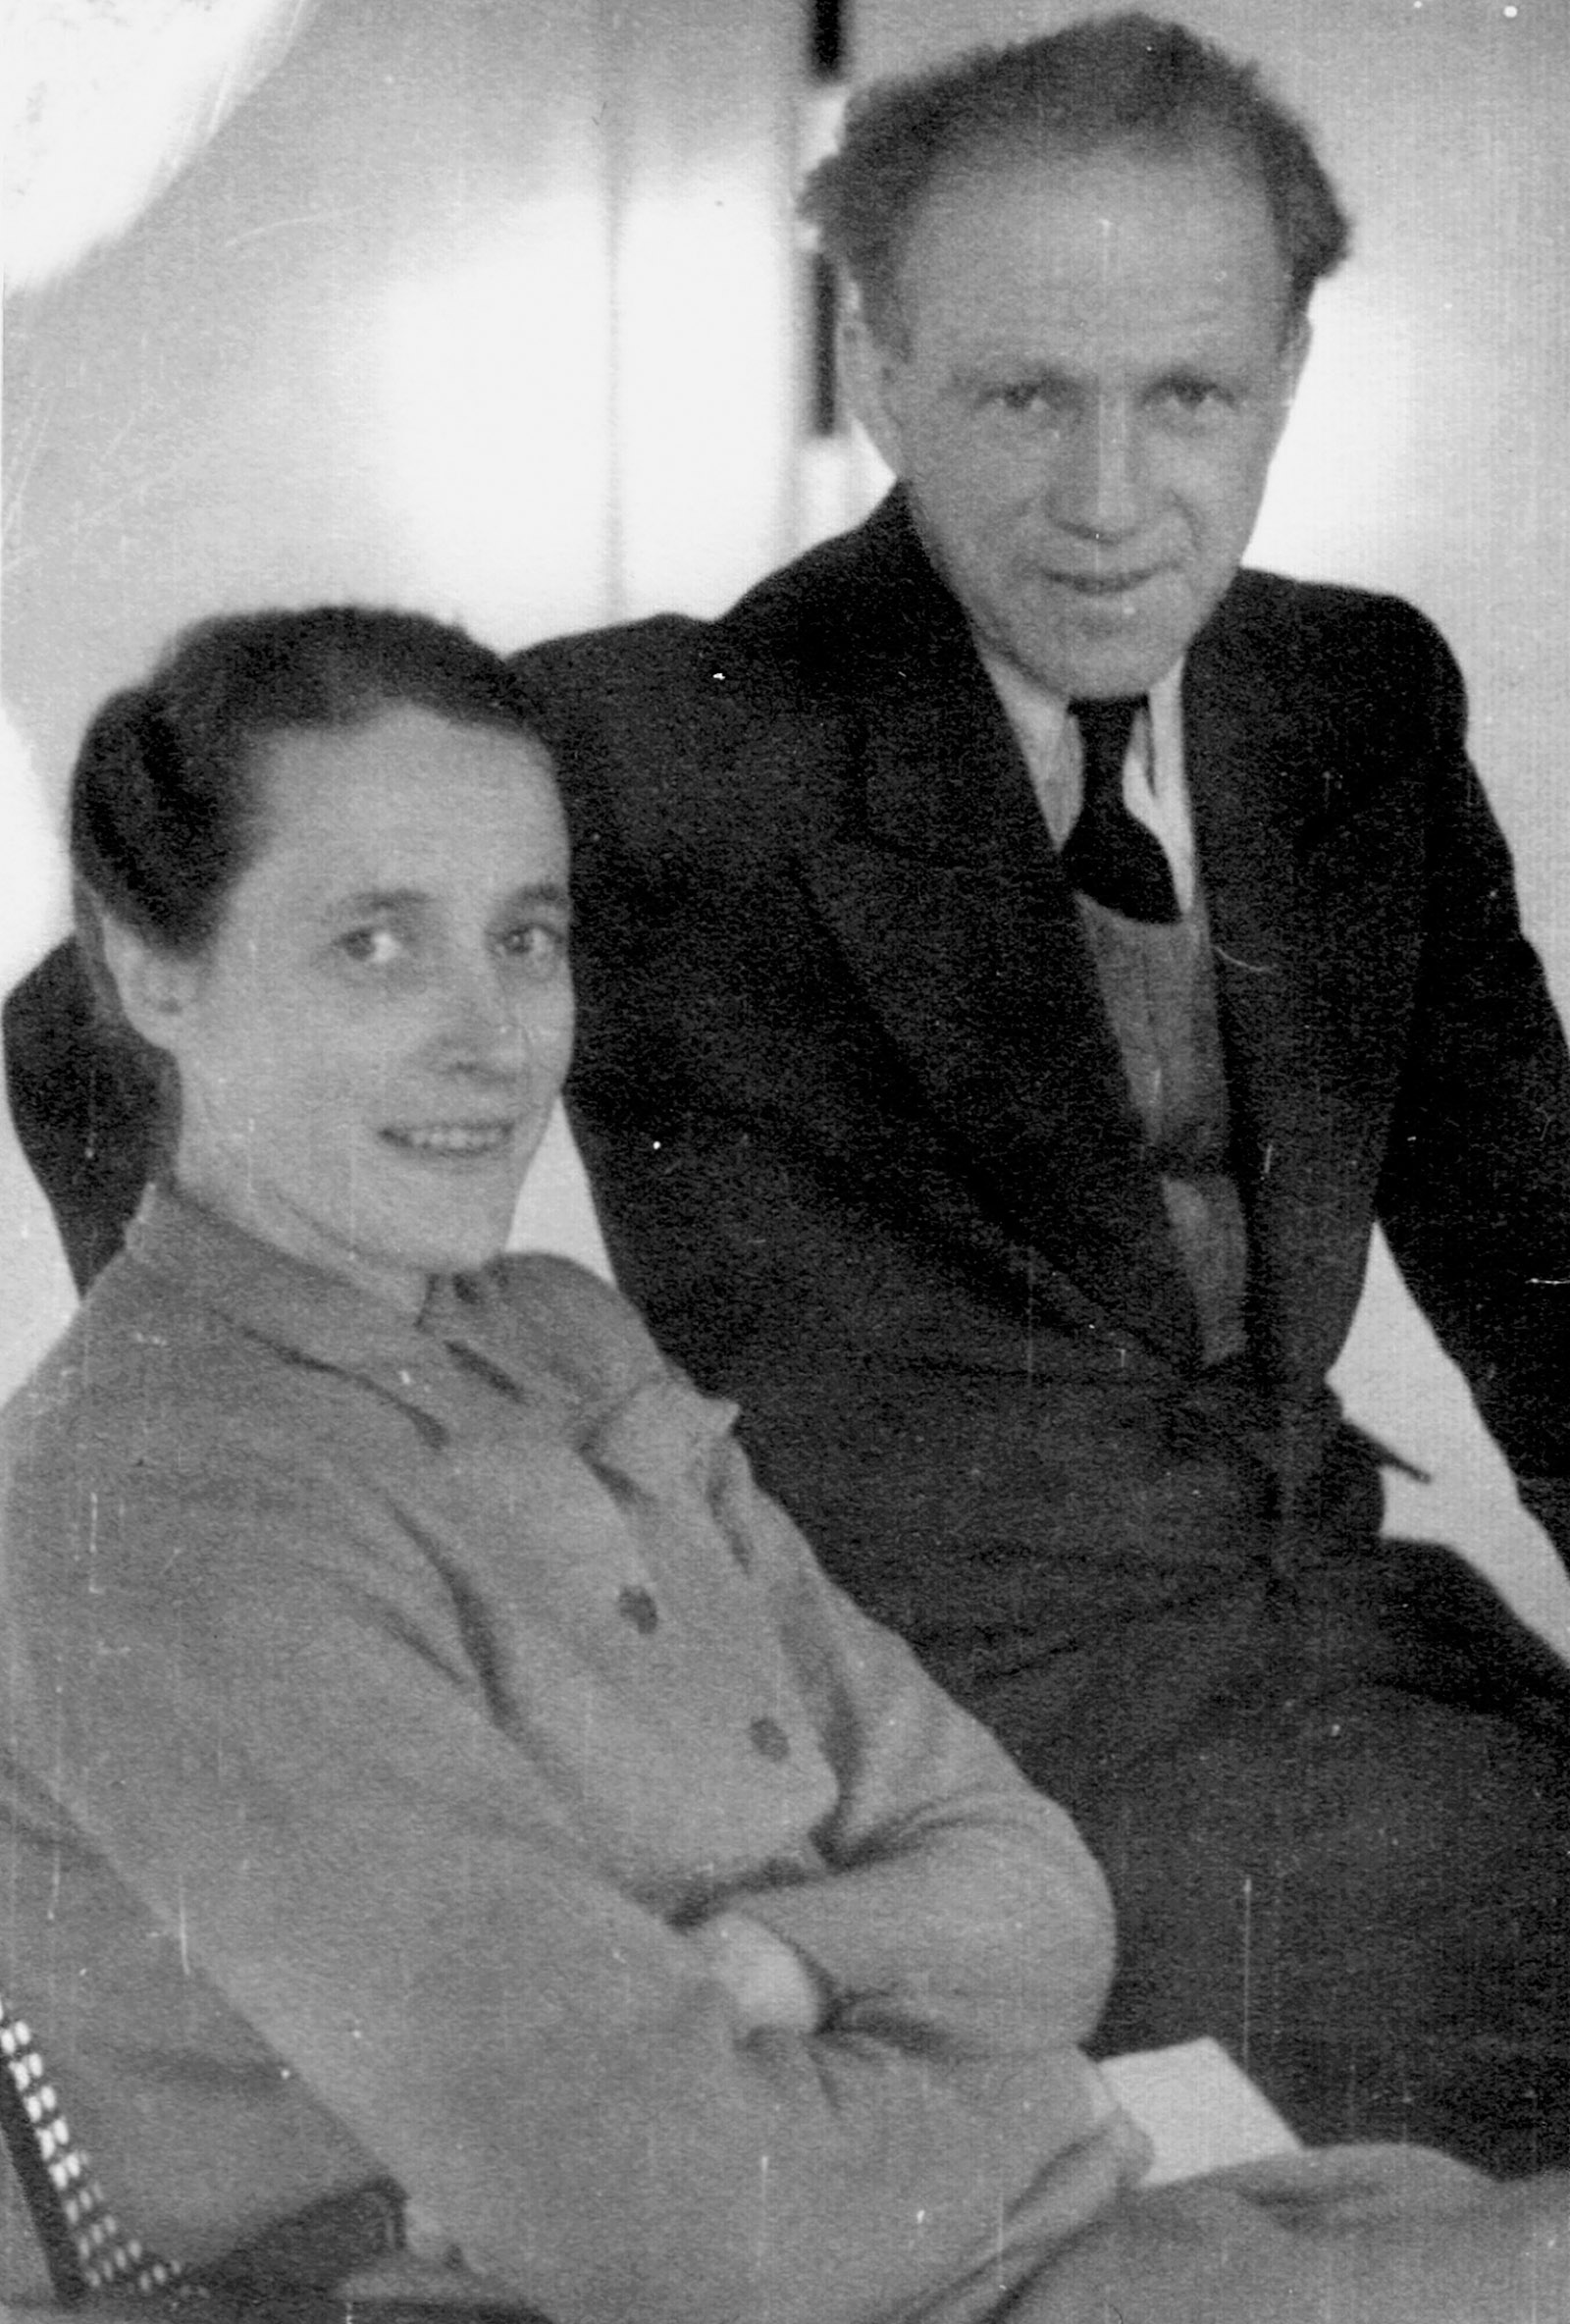 Werner and Elisabeth Heisenberg, Göttingen, Germany, circa 1946